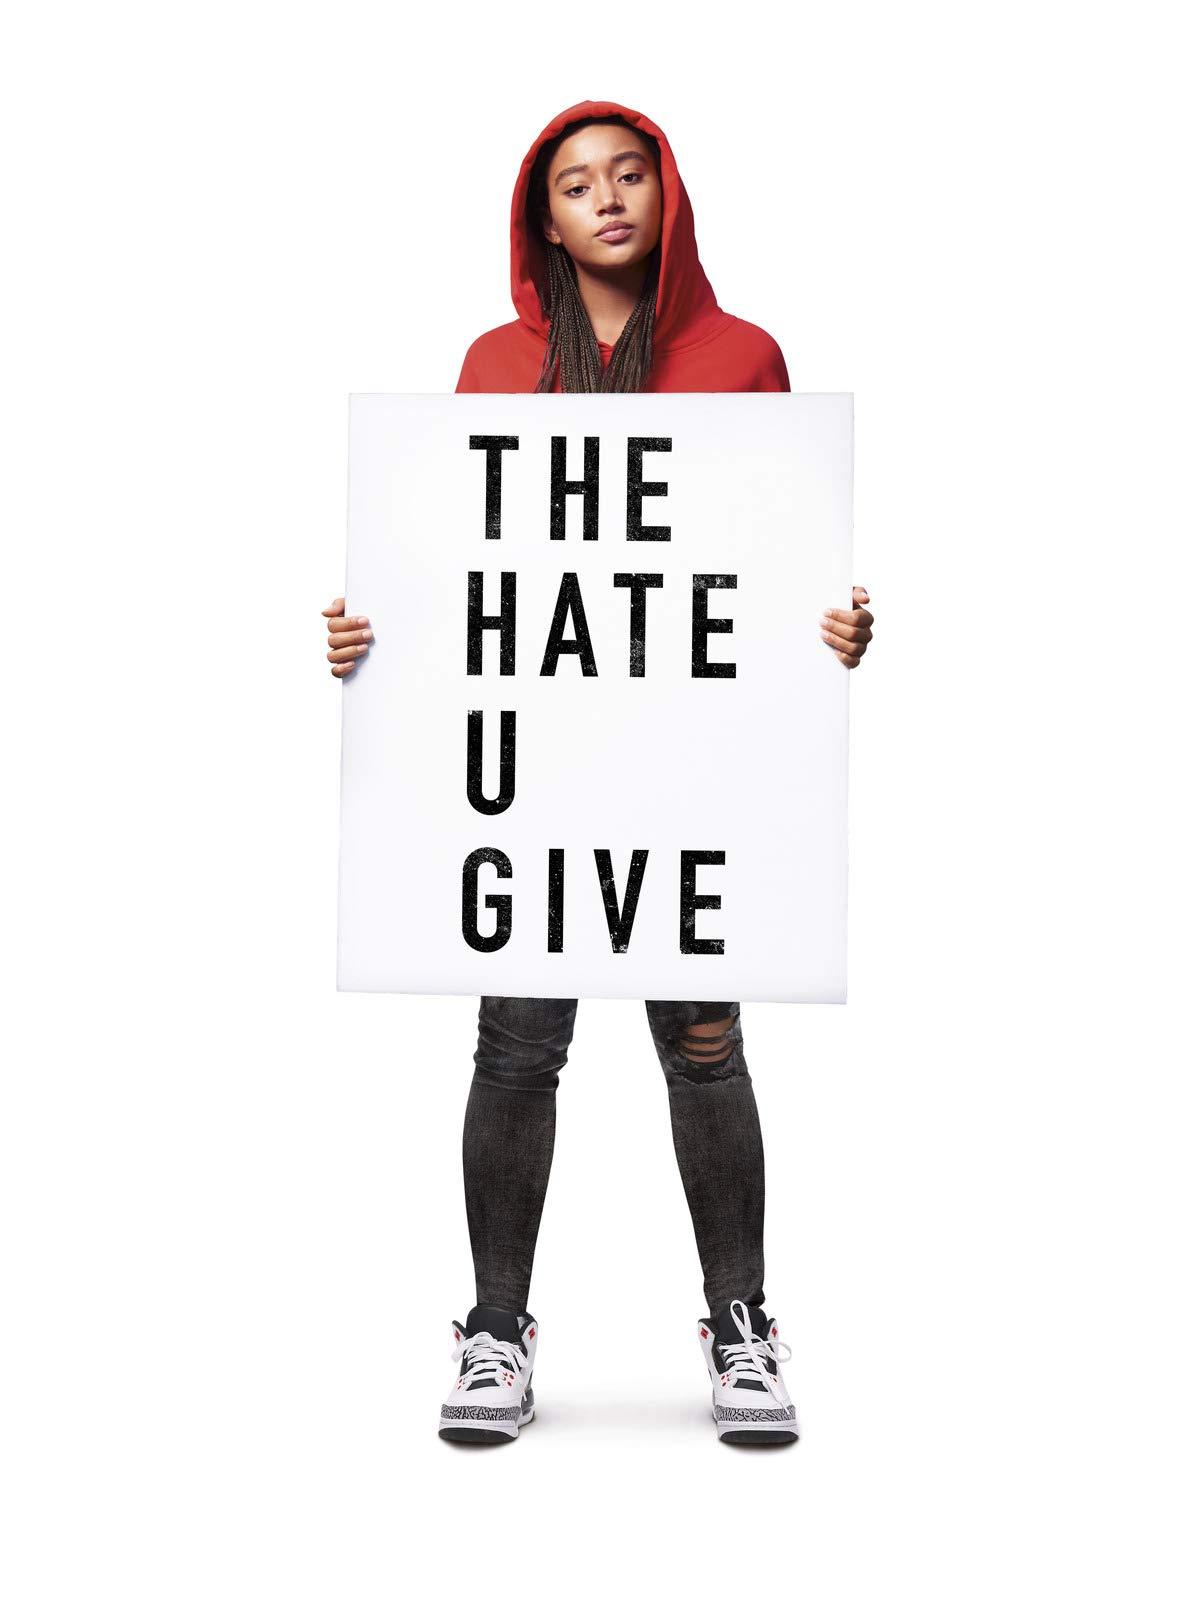 Amazon.com: The Hate U Give: Amandla Stenberg, Regina Hall, Russell ...